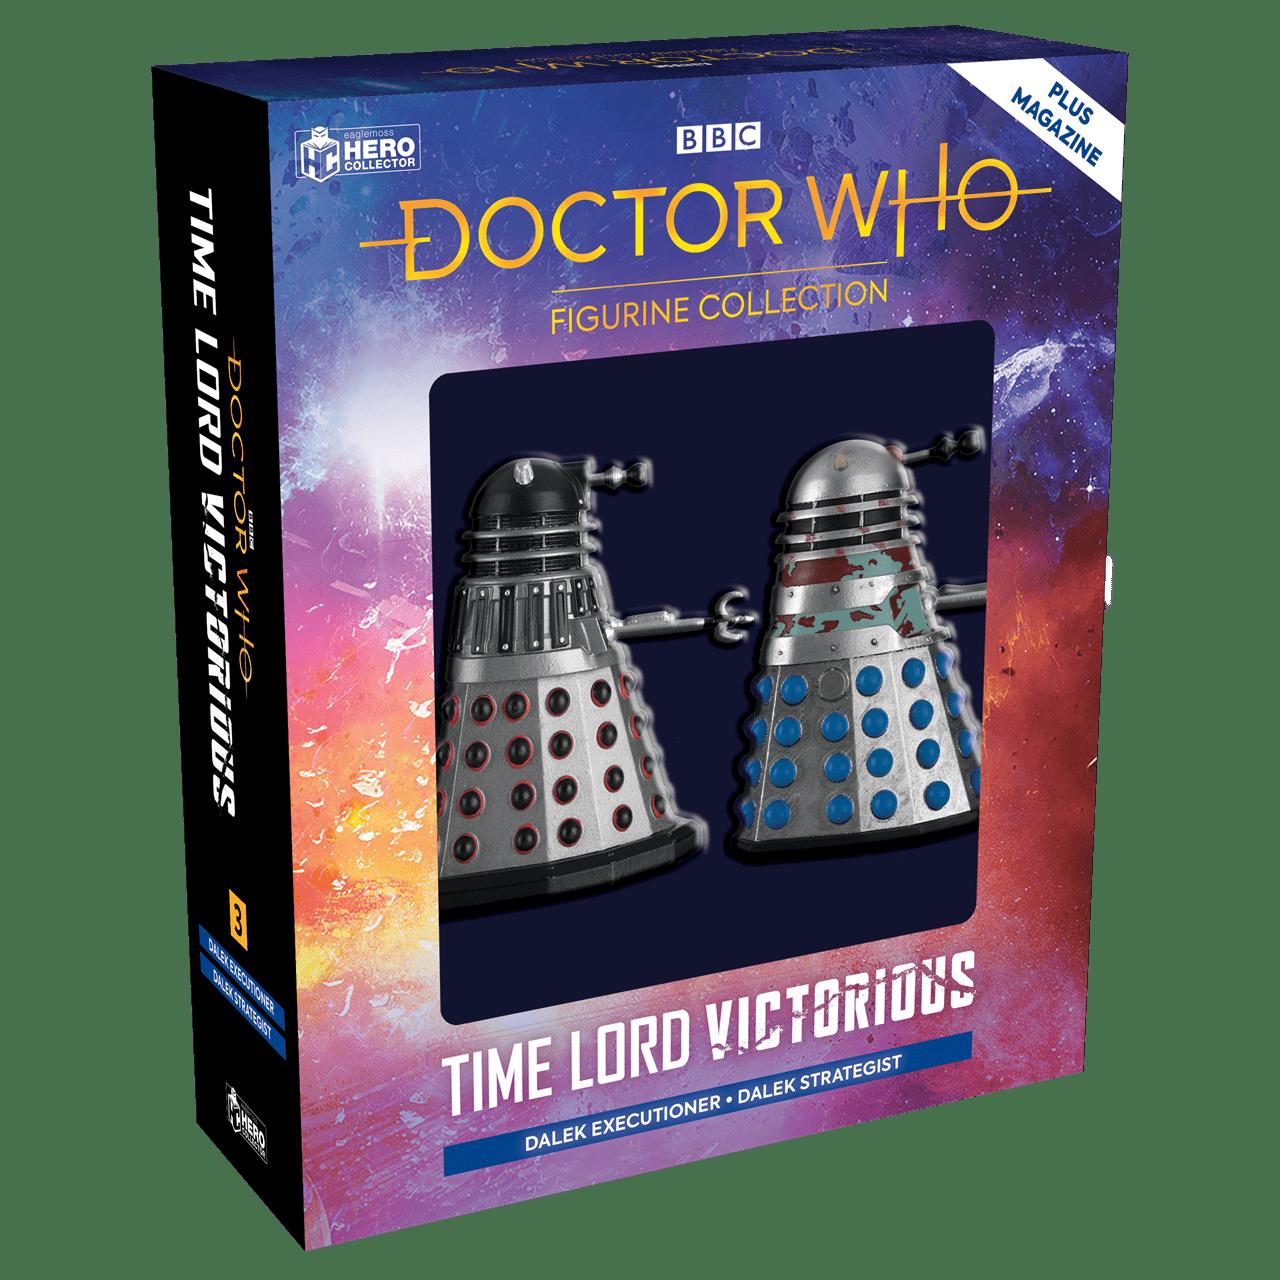 Doctor Who: Dalek Executioner and Dalek Strategist Figurine Set: Hero Collector - 1